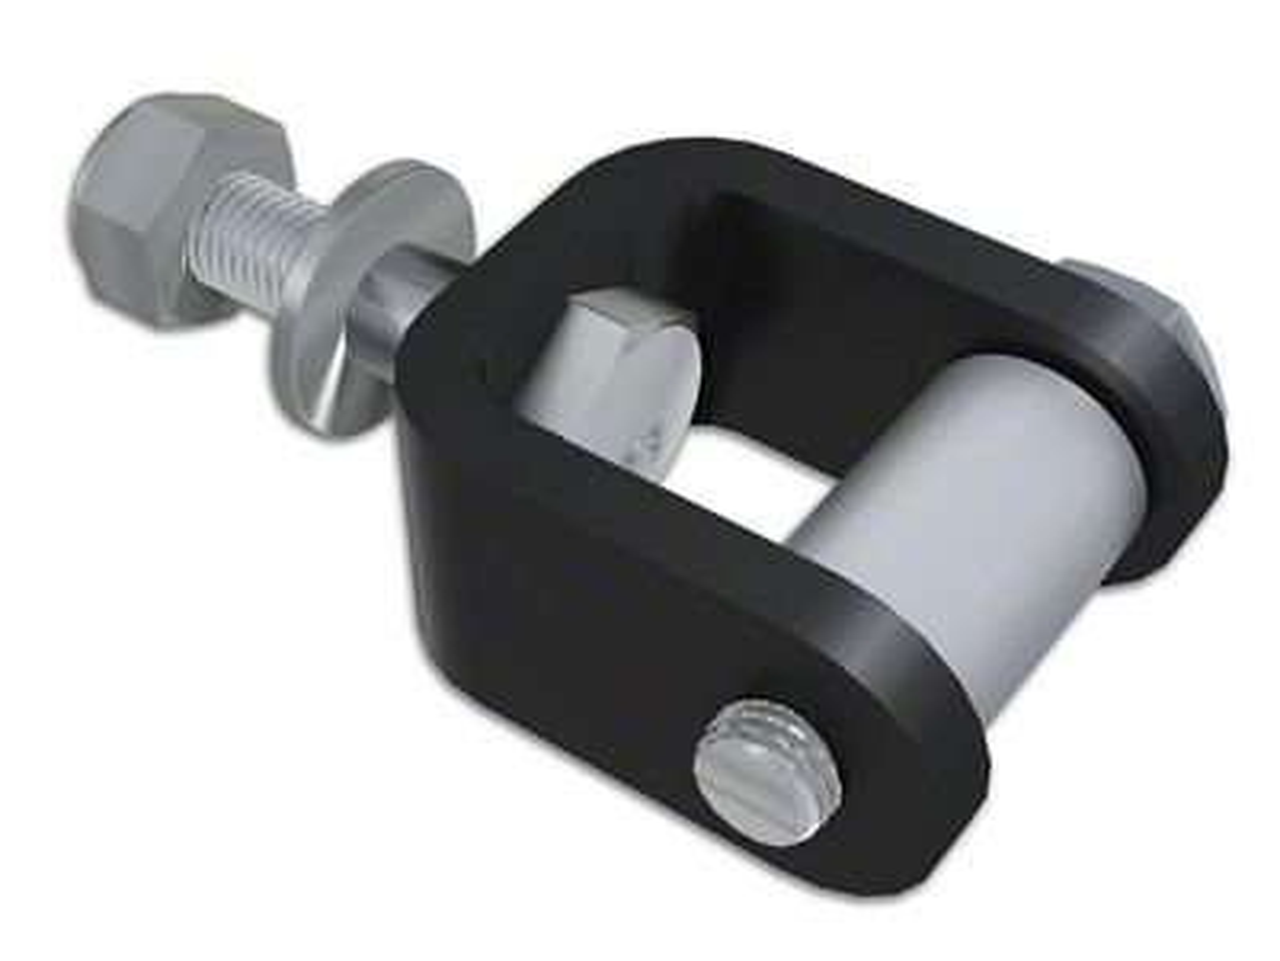 Teraflex Quick Disconnect Sway Bar Link U-Bracket w/ Hardware (97-06 Jeep Wrangler TJ)